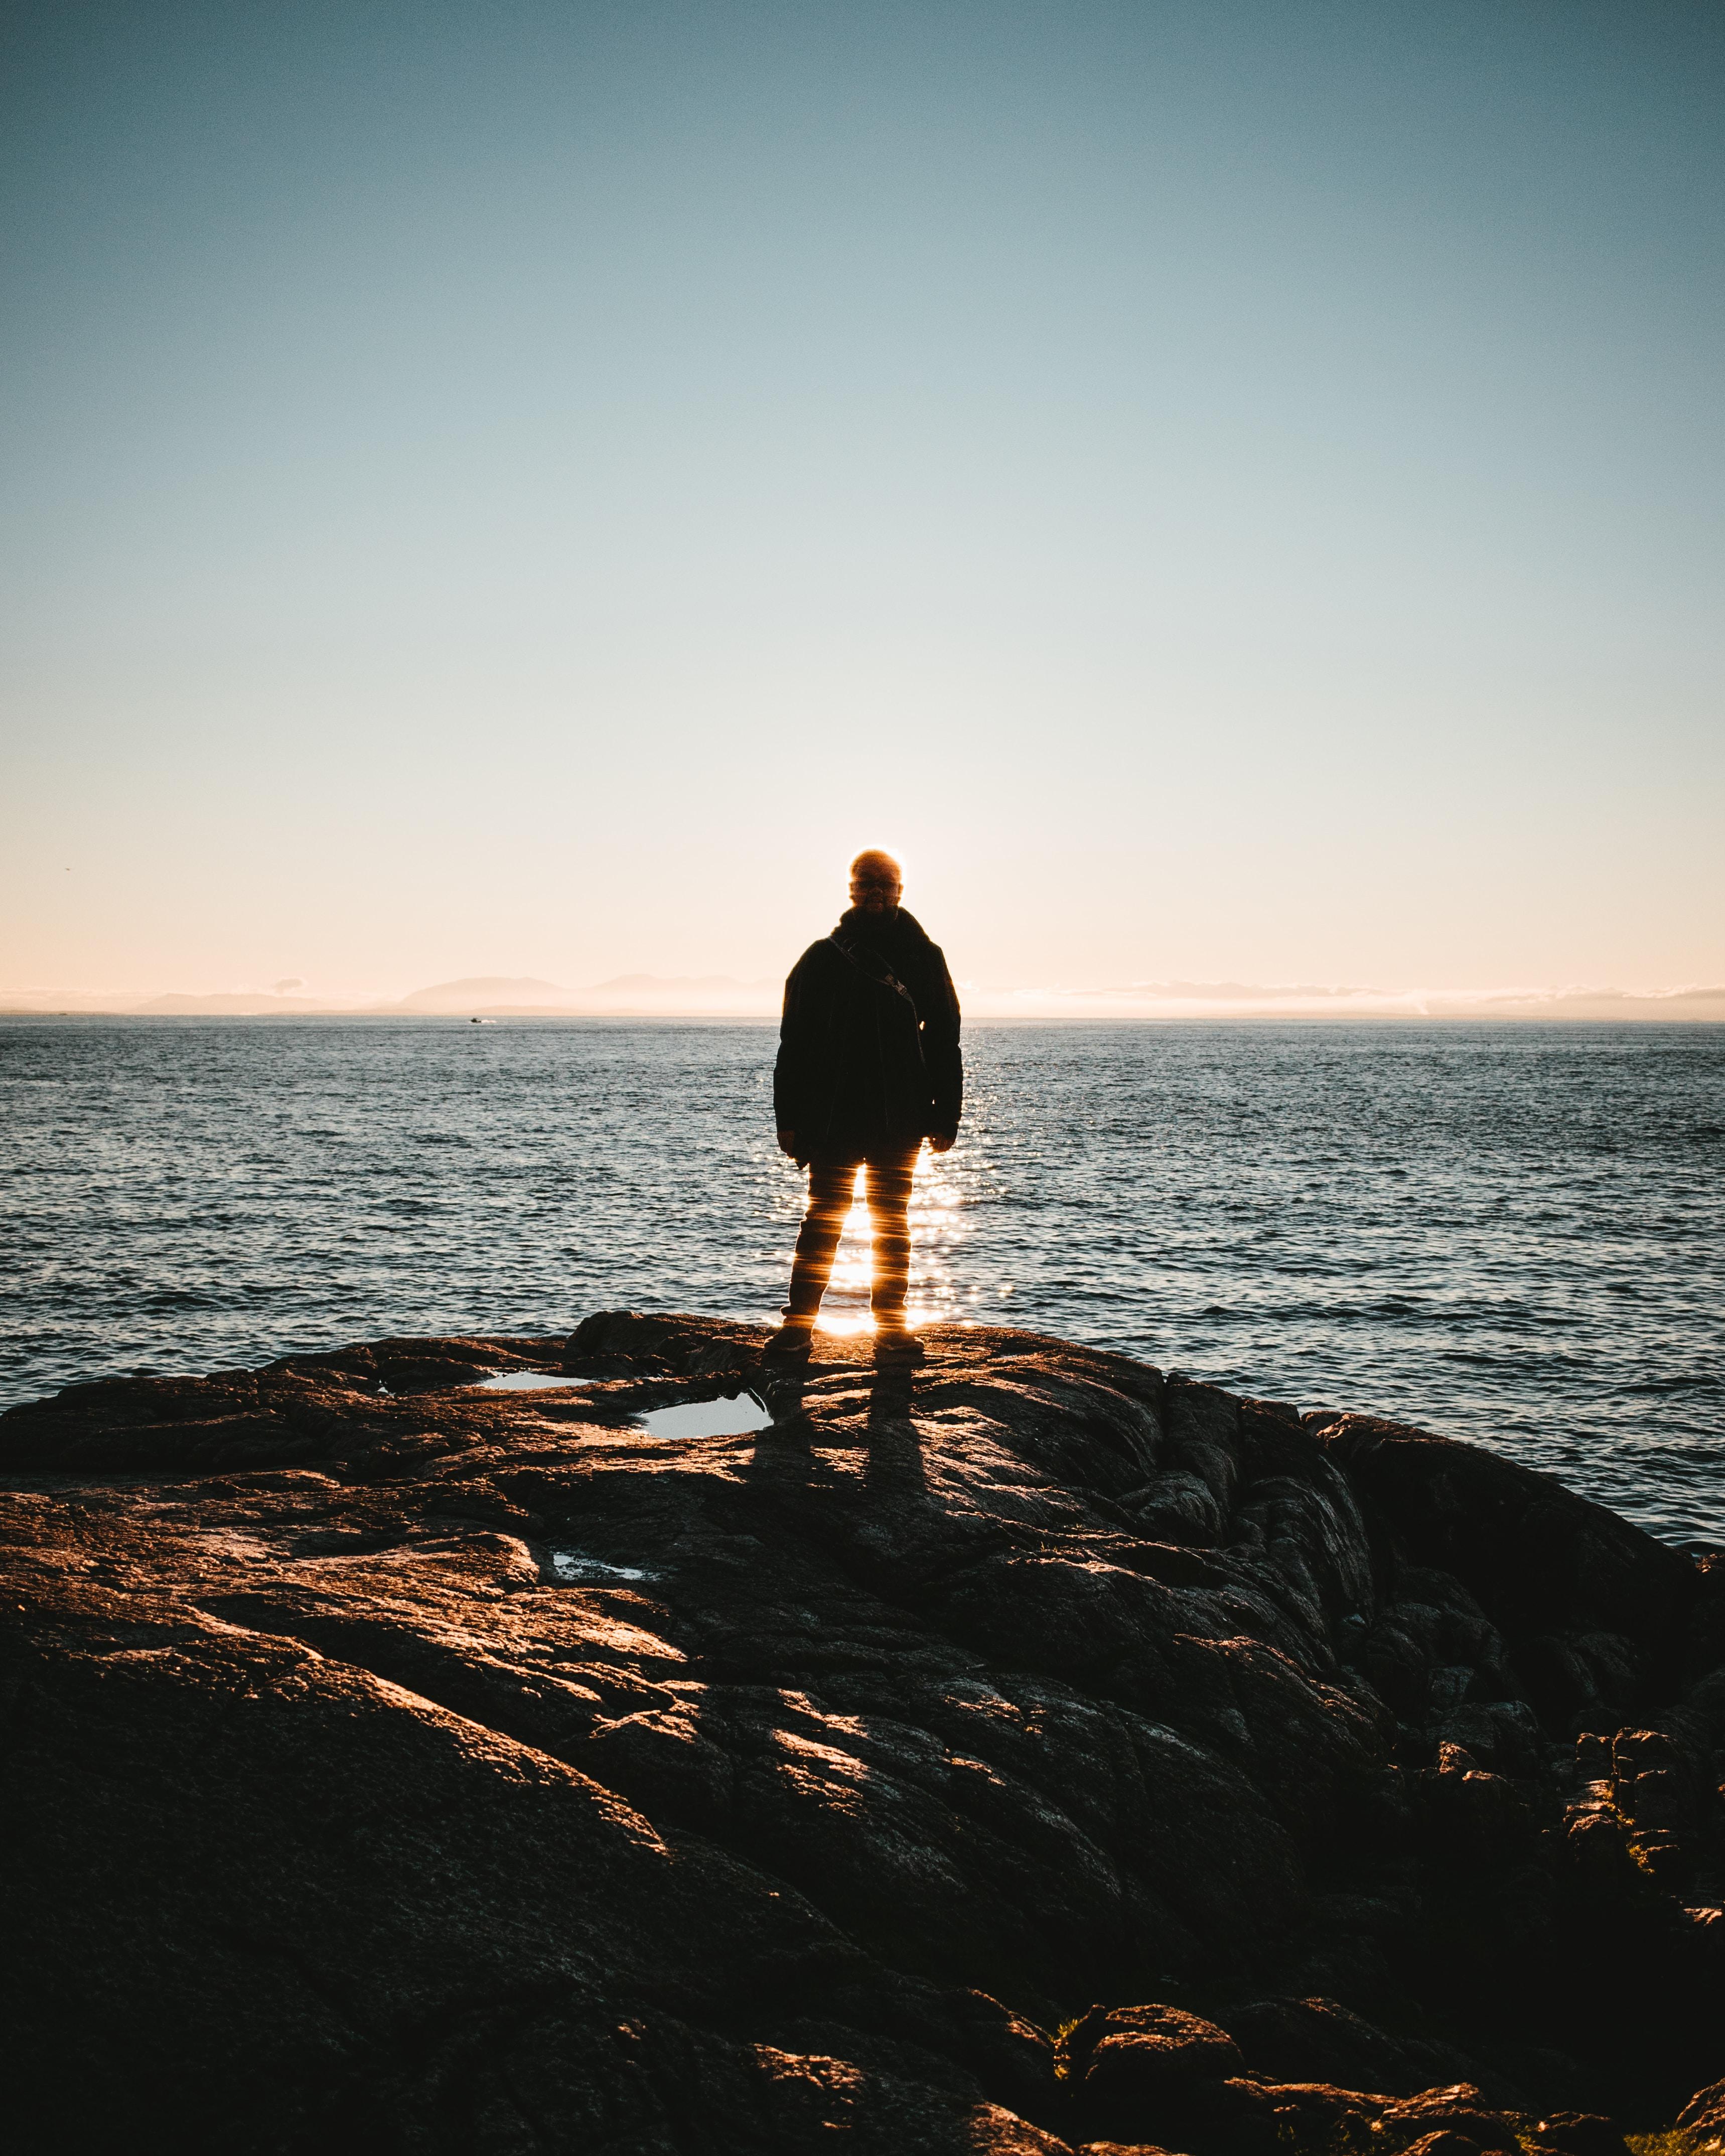 man standing on seacliff